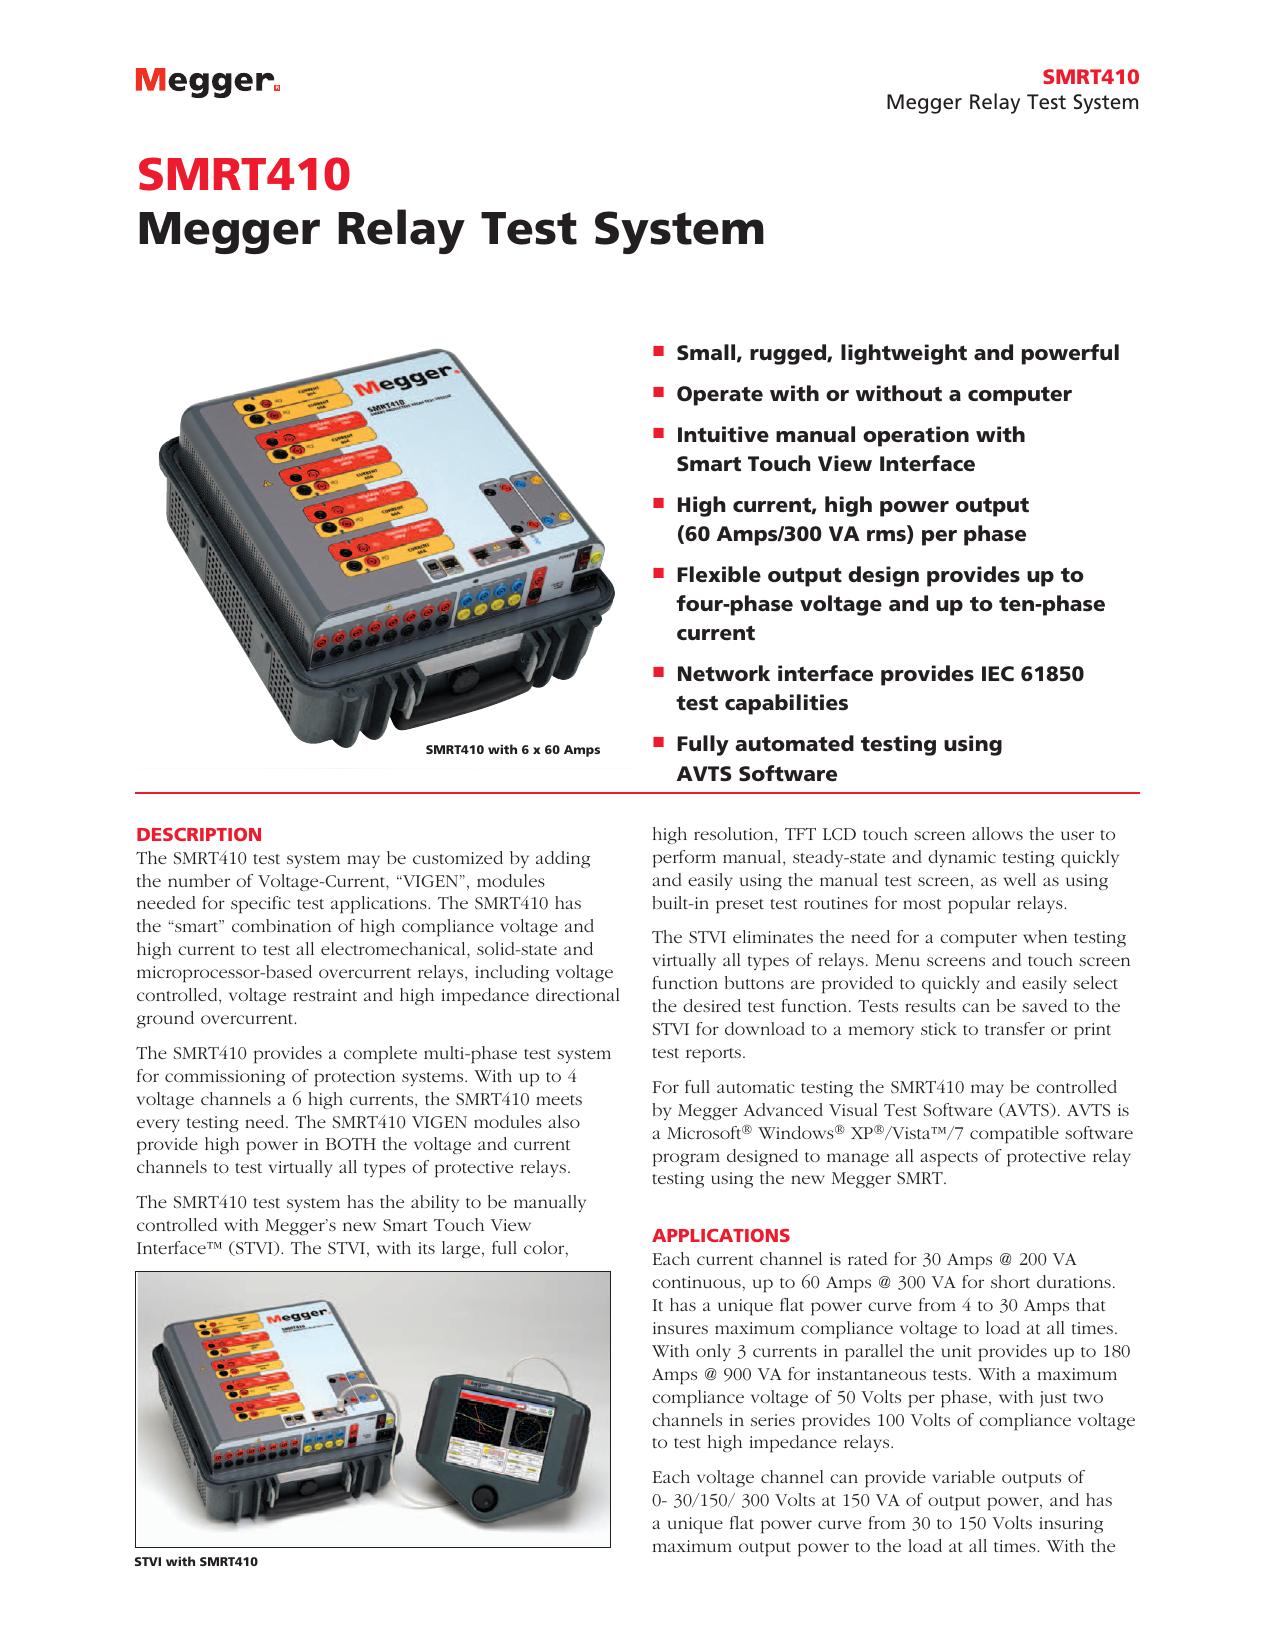 SMRT410 Megger Relay Test System - Multi | manualzz com